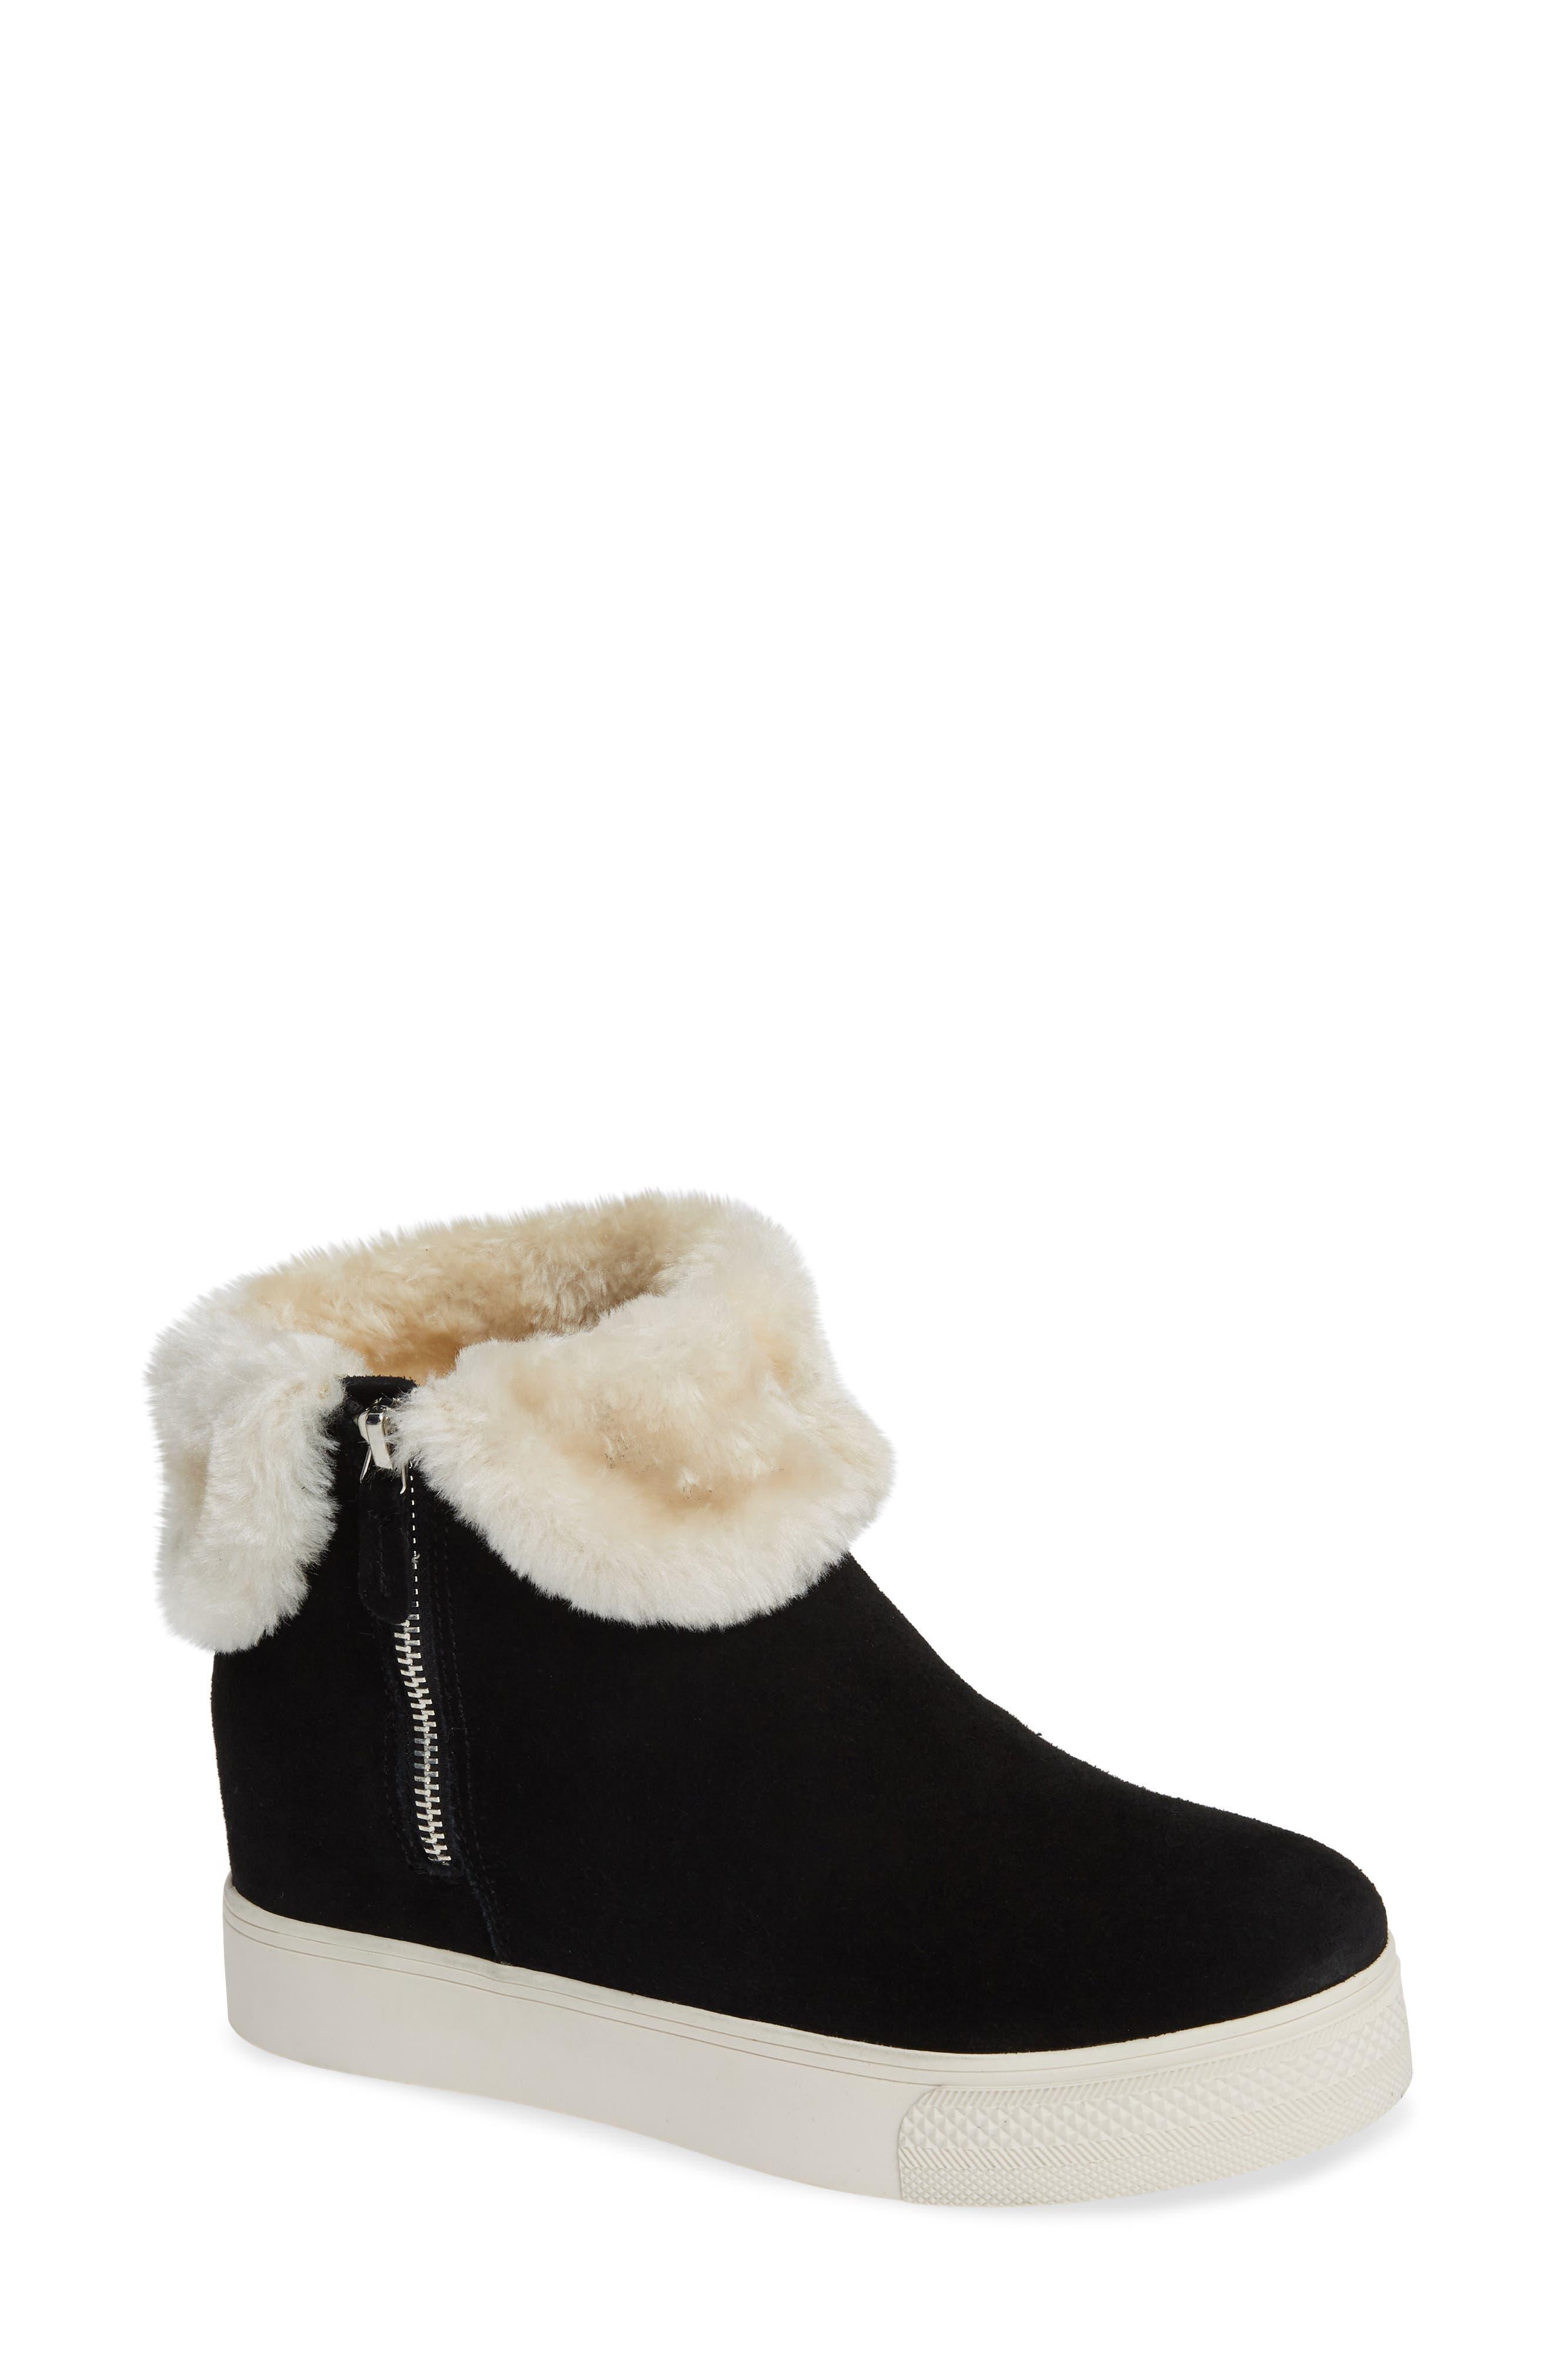 STEVE MADDEN,                             Faux Fur Lined Sneaker,                             Main thumbnail 1, color,                             006